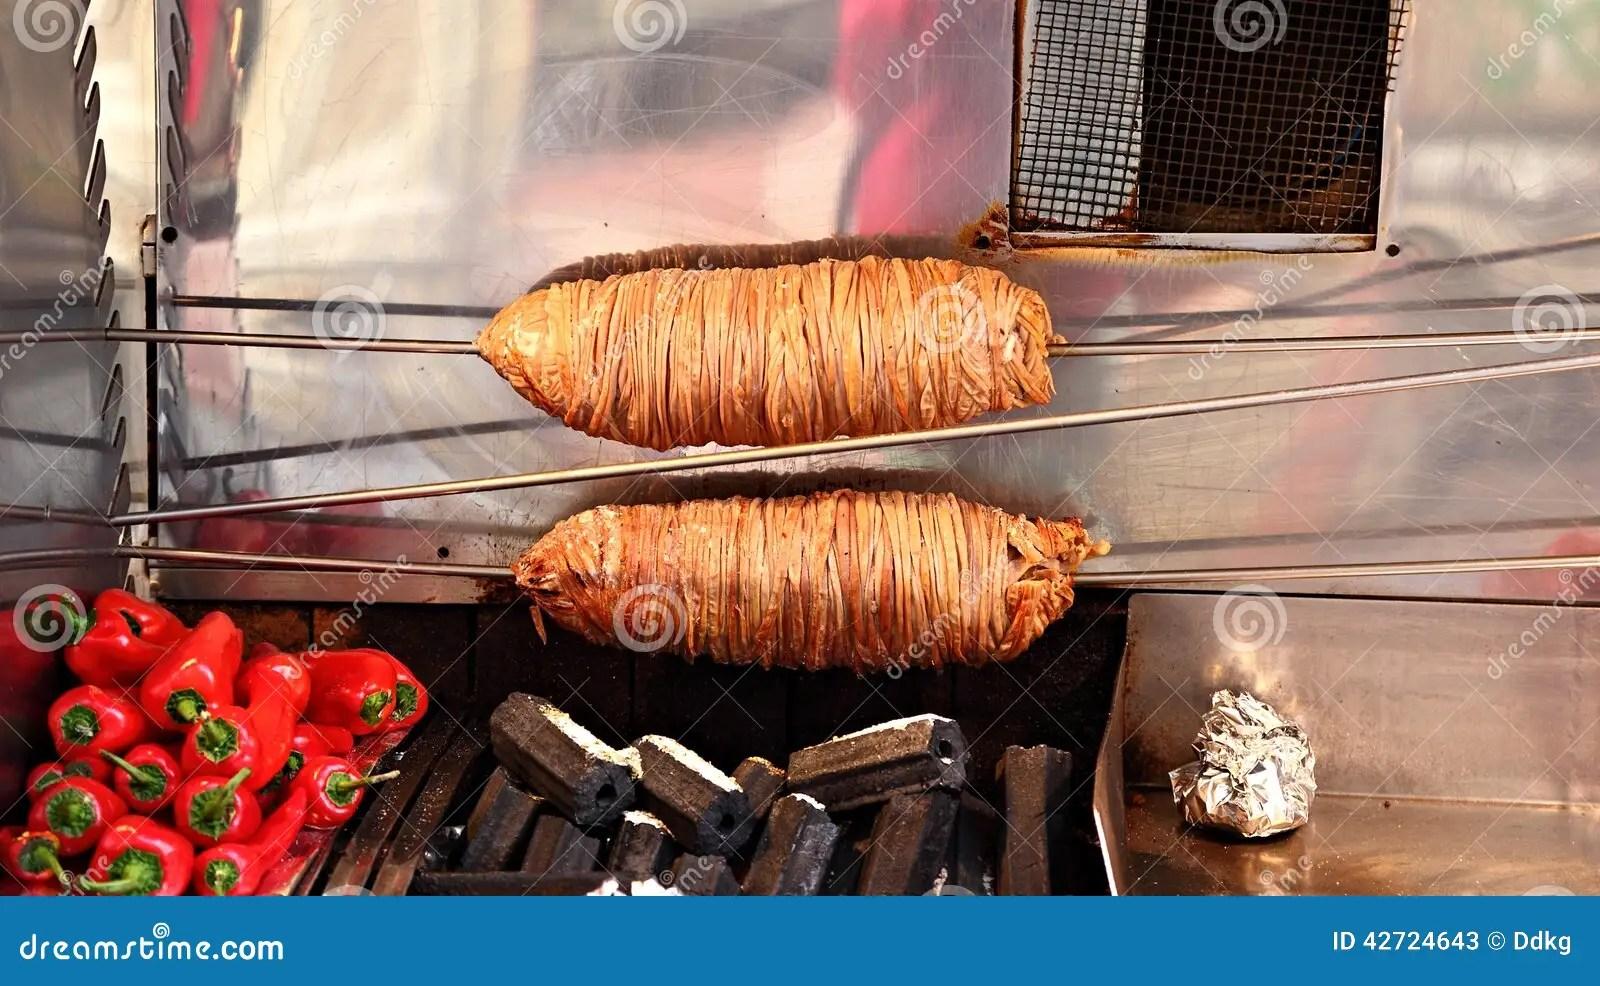 Cucina turca Kokorec immagine stock Immagine di corsa